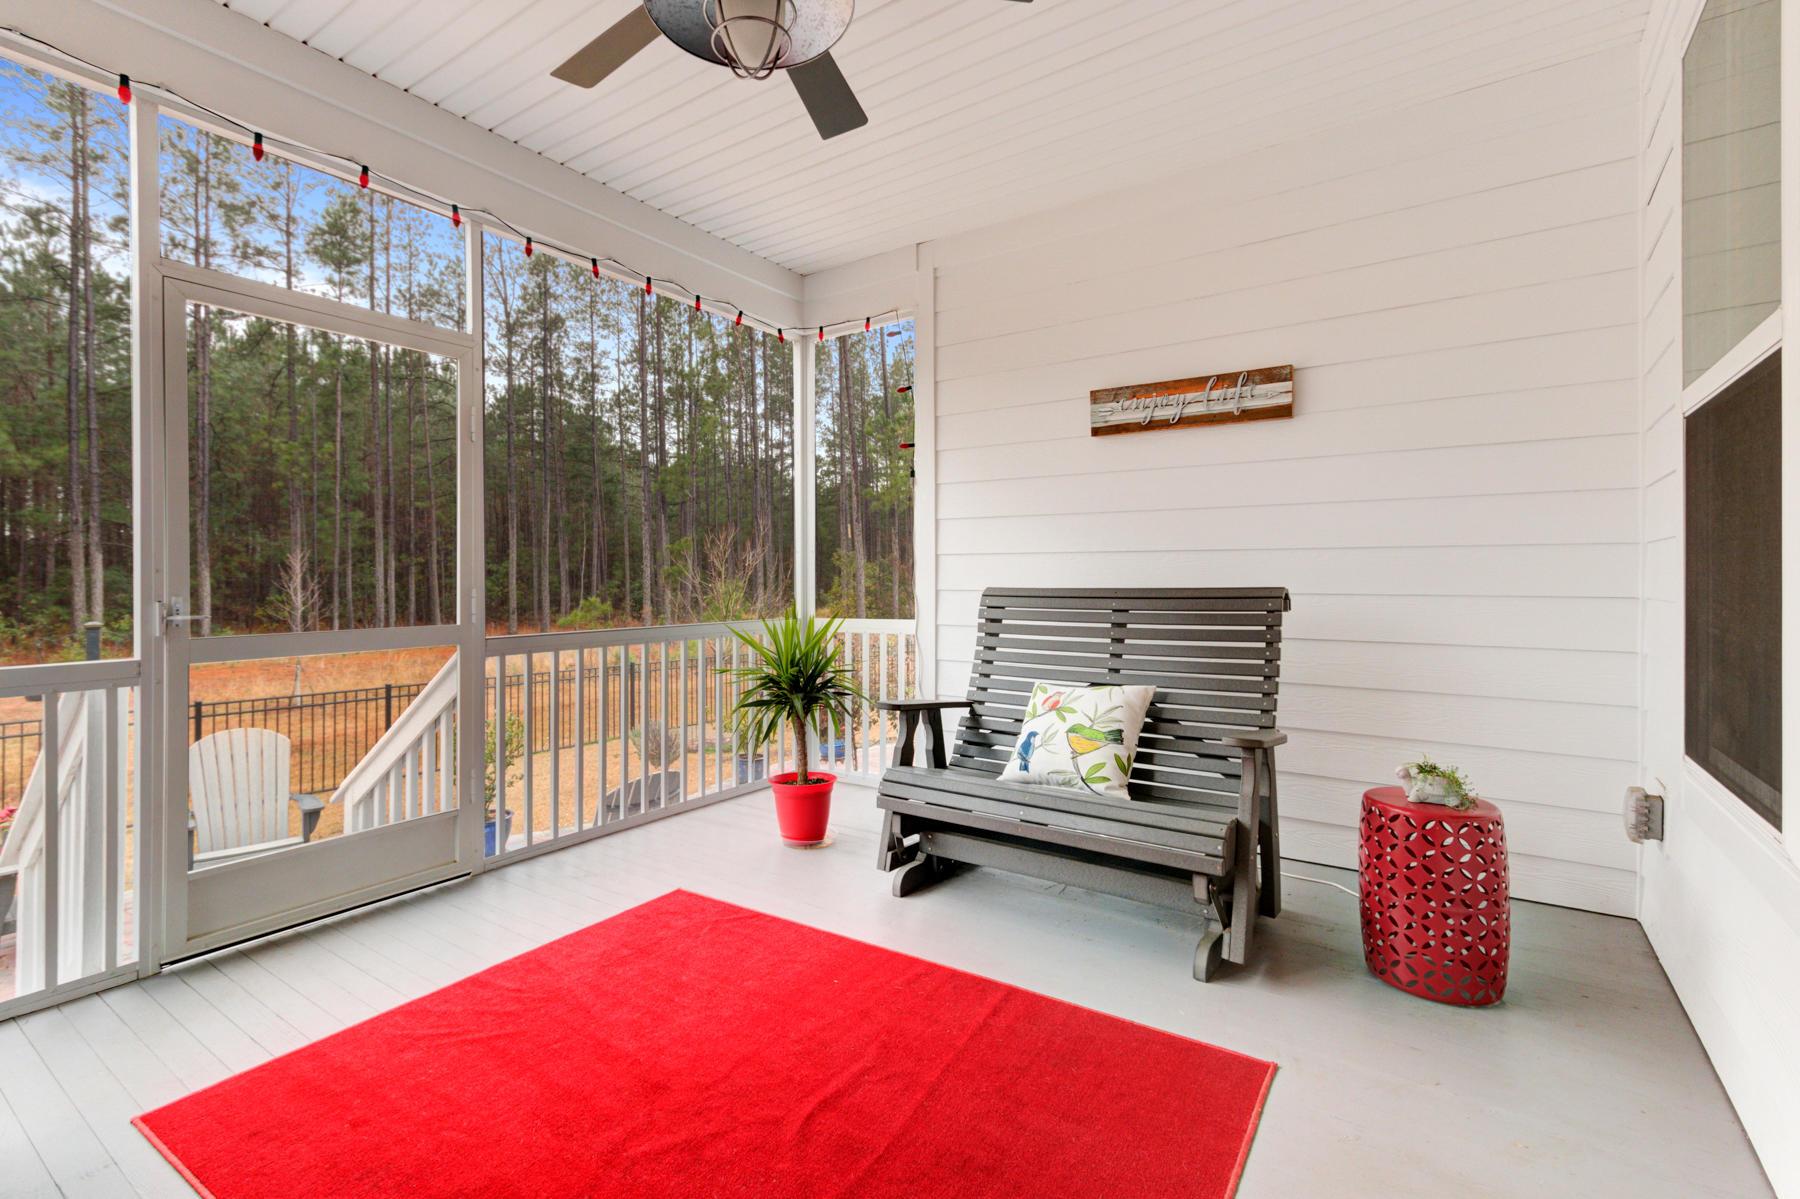 Cane Bay Plantation Homes For Sale - 251 Calm Water, Summerville, SC - 2